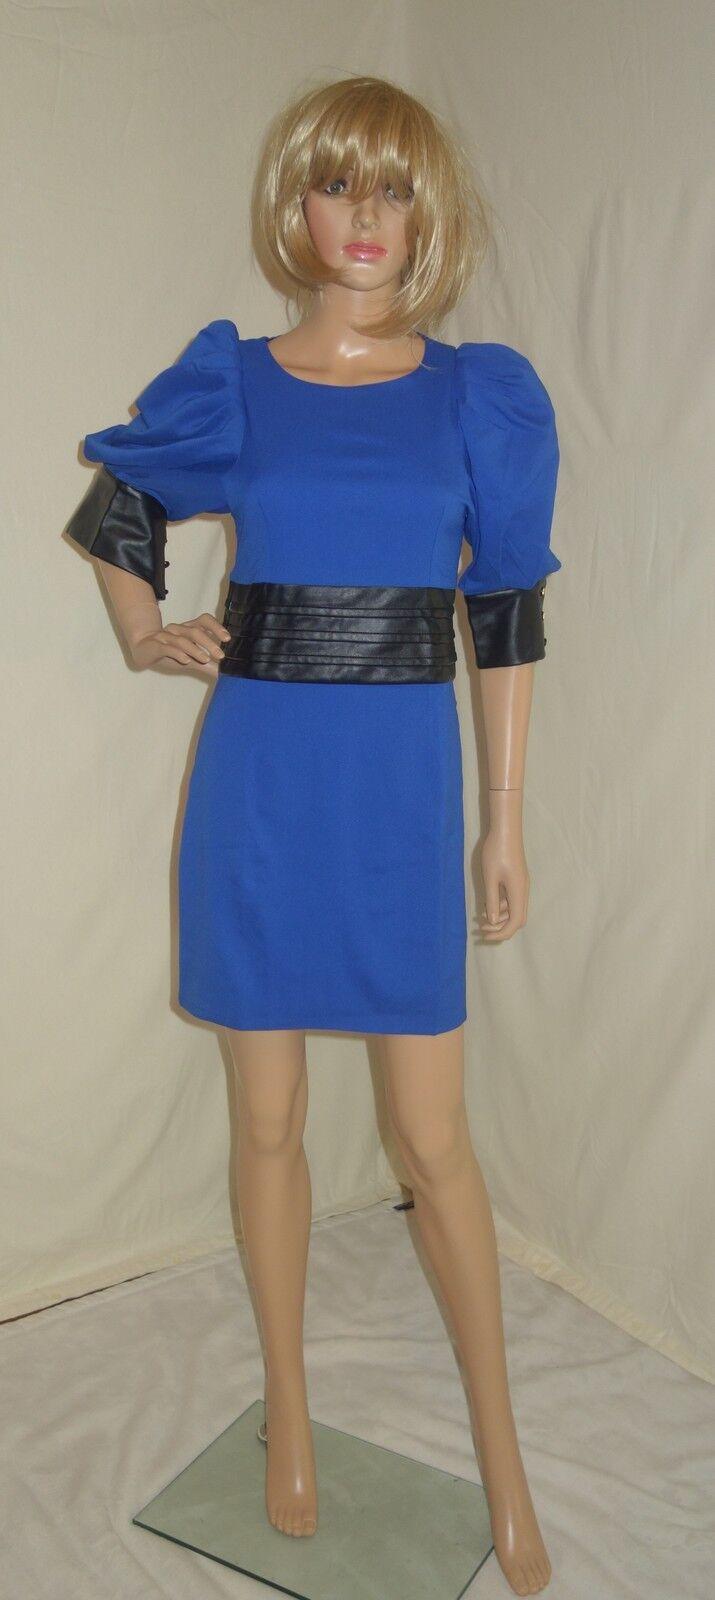 Gracia PUFF Sleeve Mixed Media Blau schwarz Dress Größe M NEW